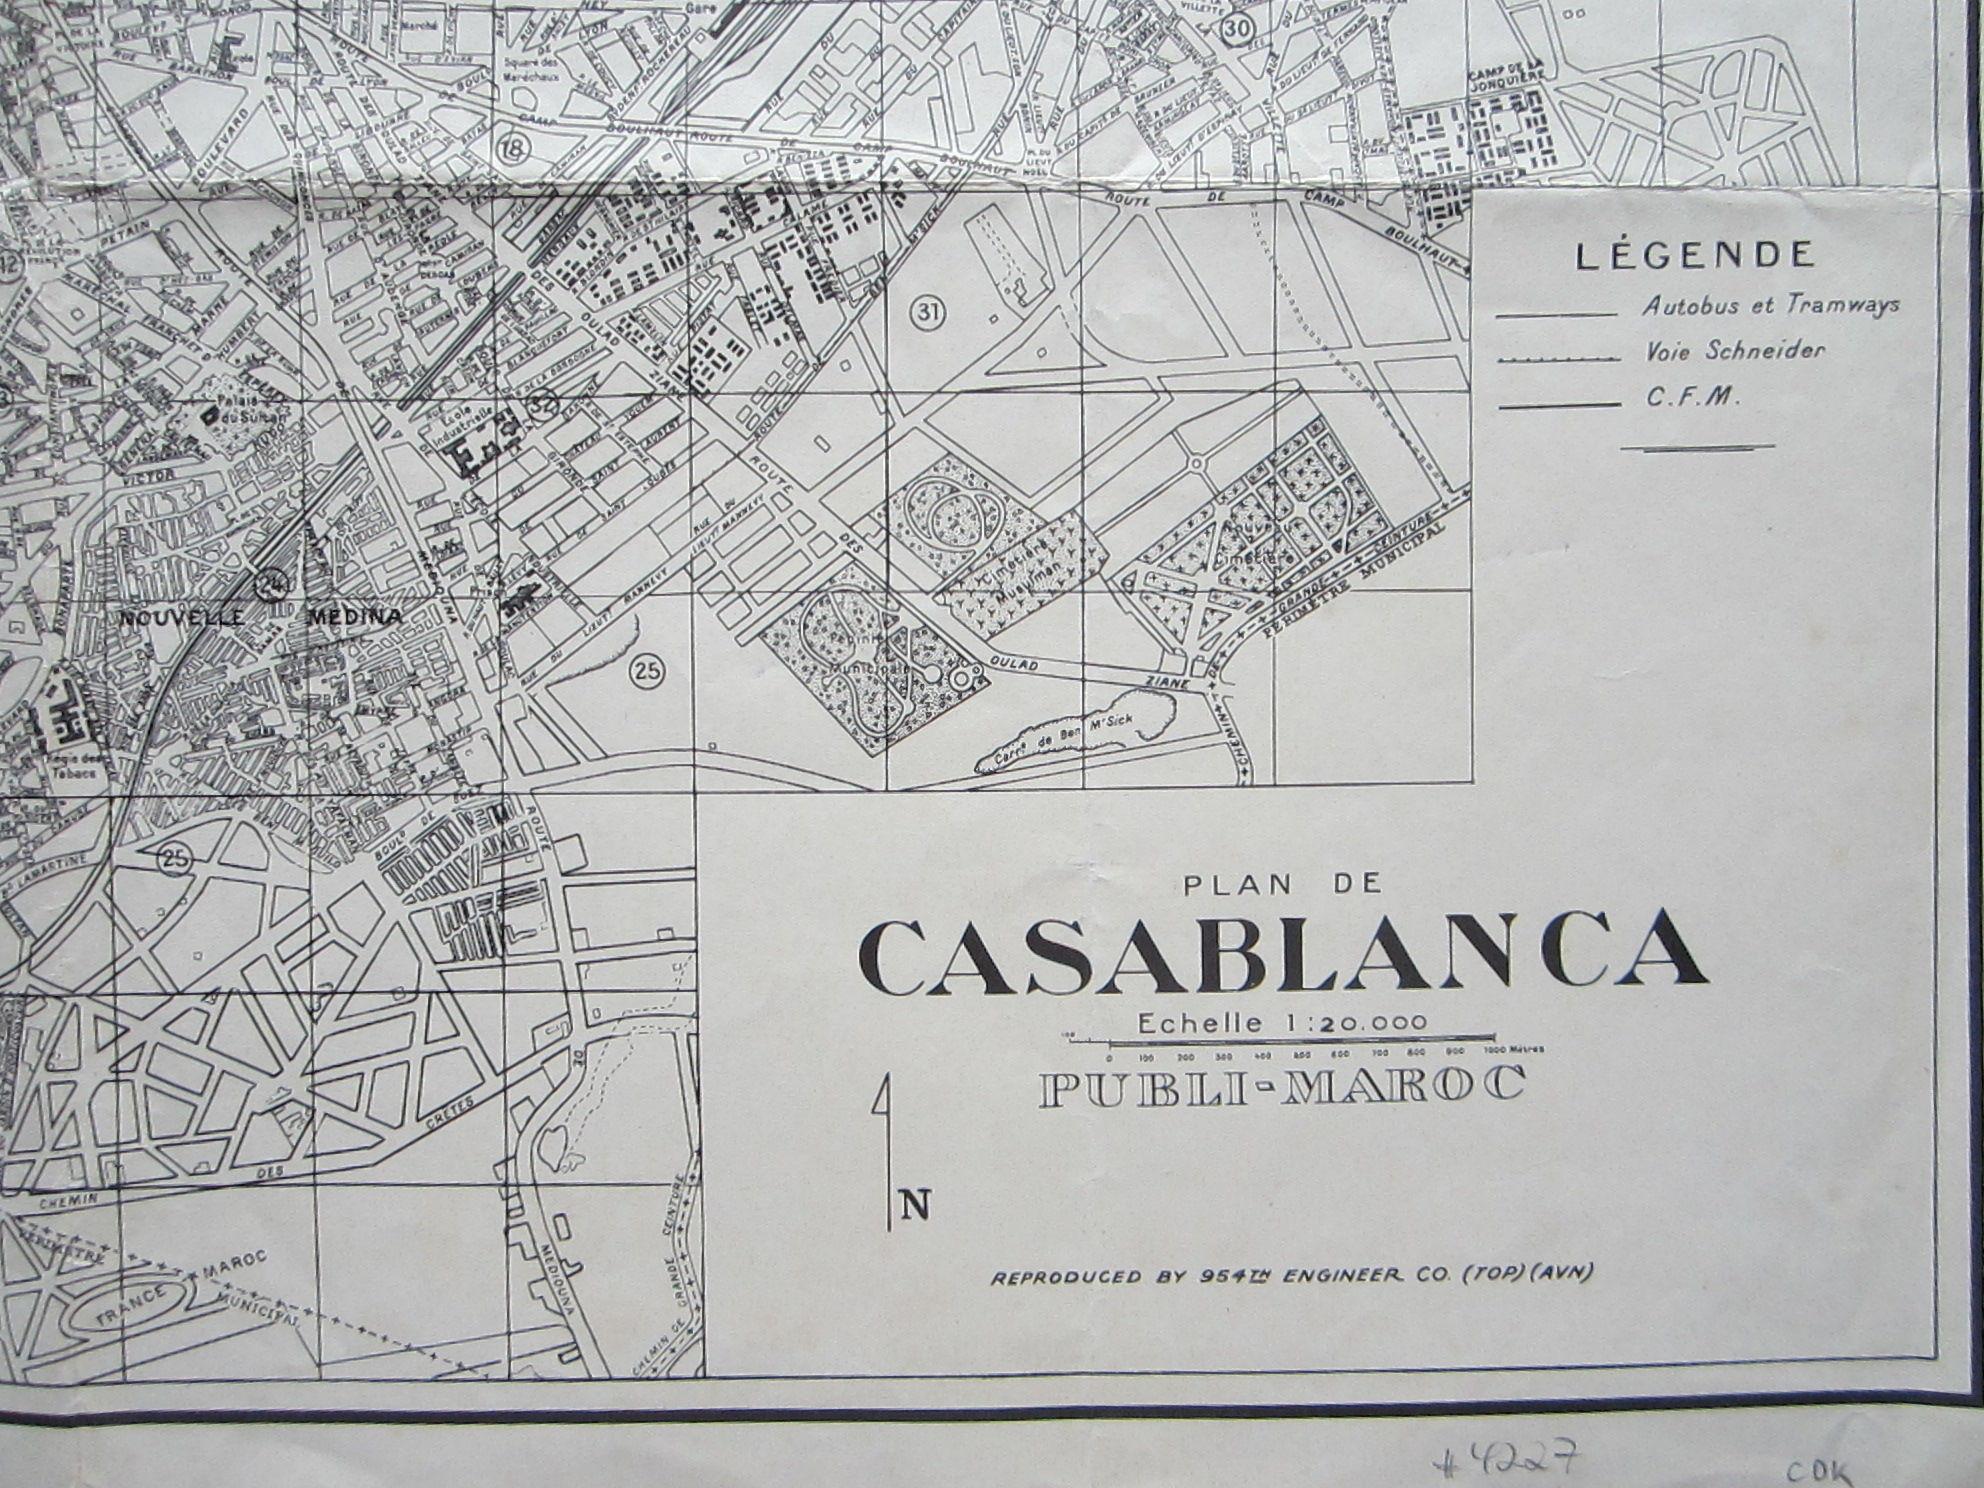 Plan de Casablanca … Reproduced by 954th Engineer Co. (TOP) (AVN) (photo 5)